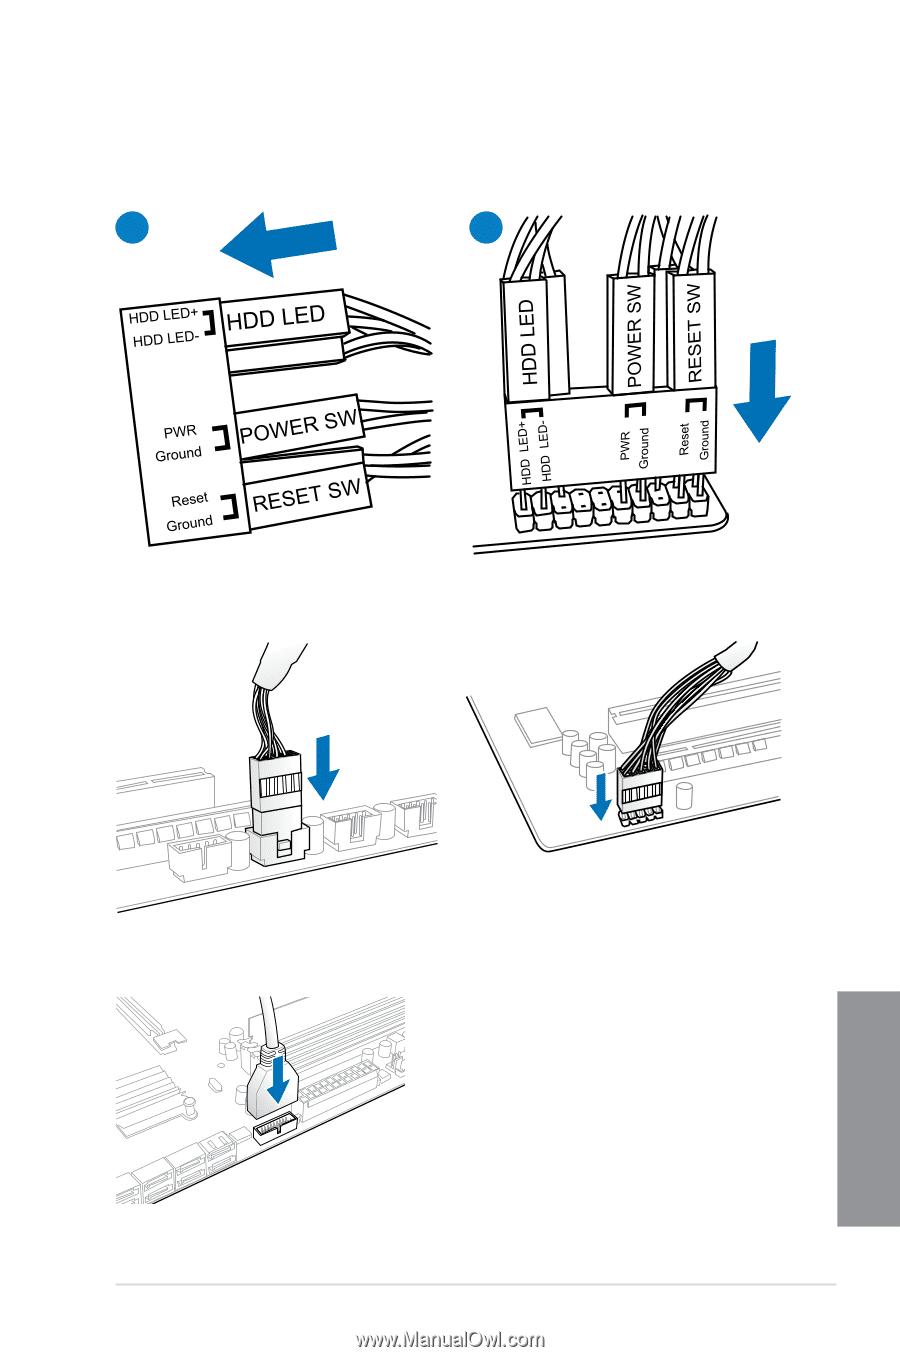 Asus MAXIMUS VII HERO | User Guide - Page 79